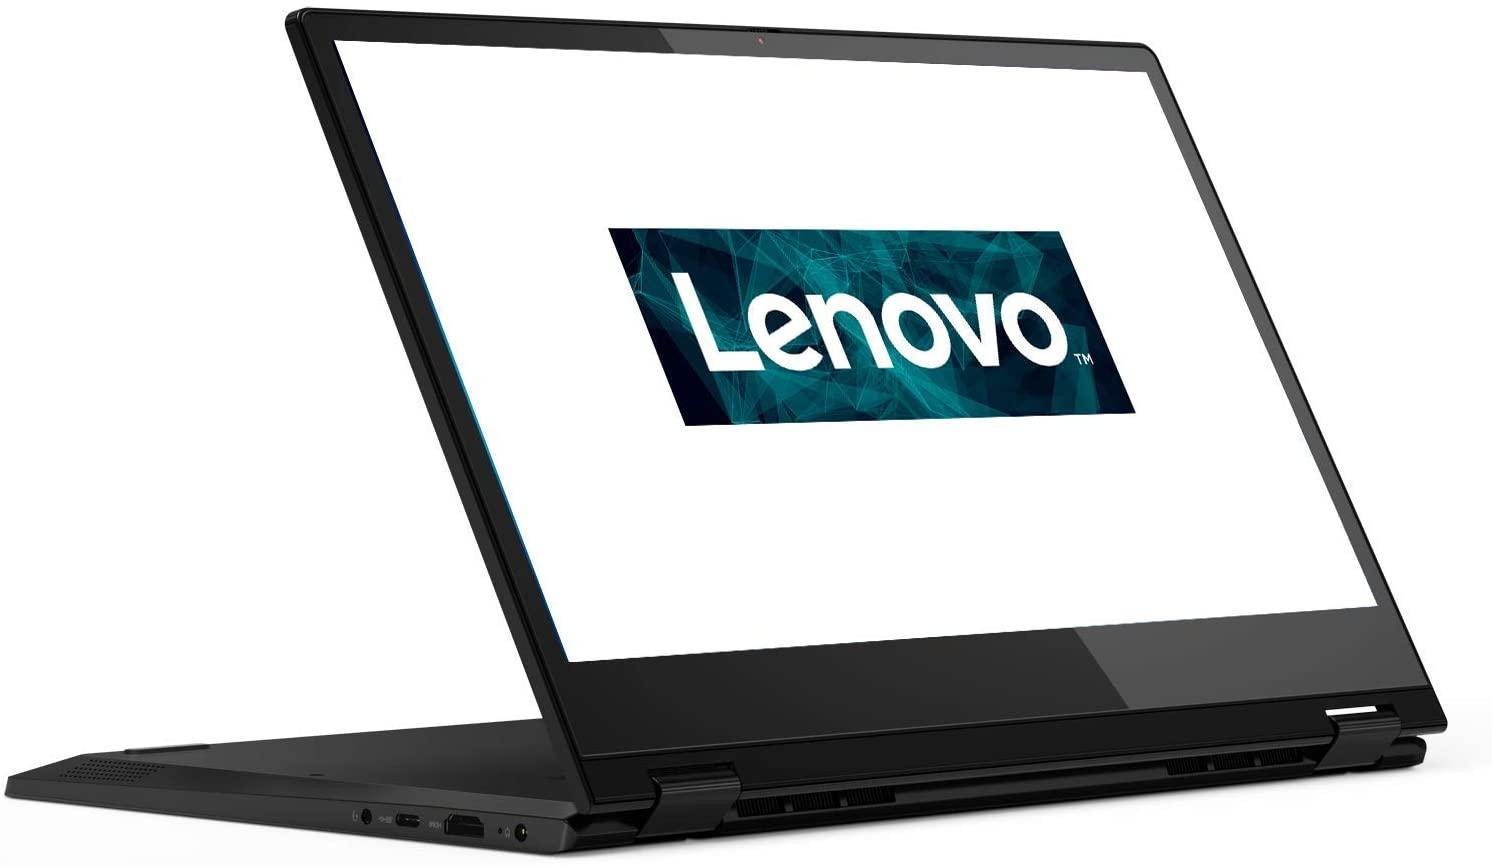 Amazon: Lenovo IdeaPad C340 - 14 Zoll, FHD, IPS, Touch-Convertible Notebook, i5-10210U, 8GB RAM, 1TB SSD, Intel UHD-Grafik, Windows 10